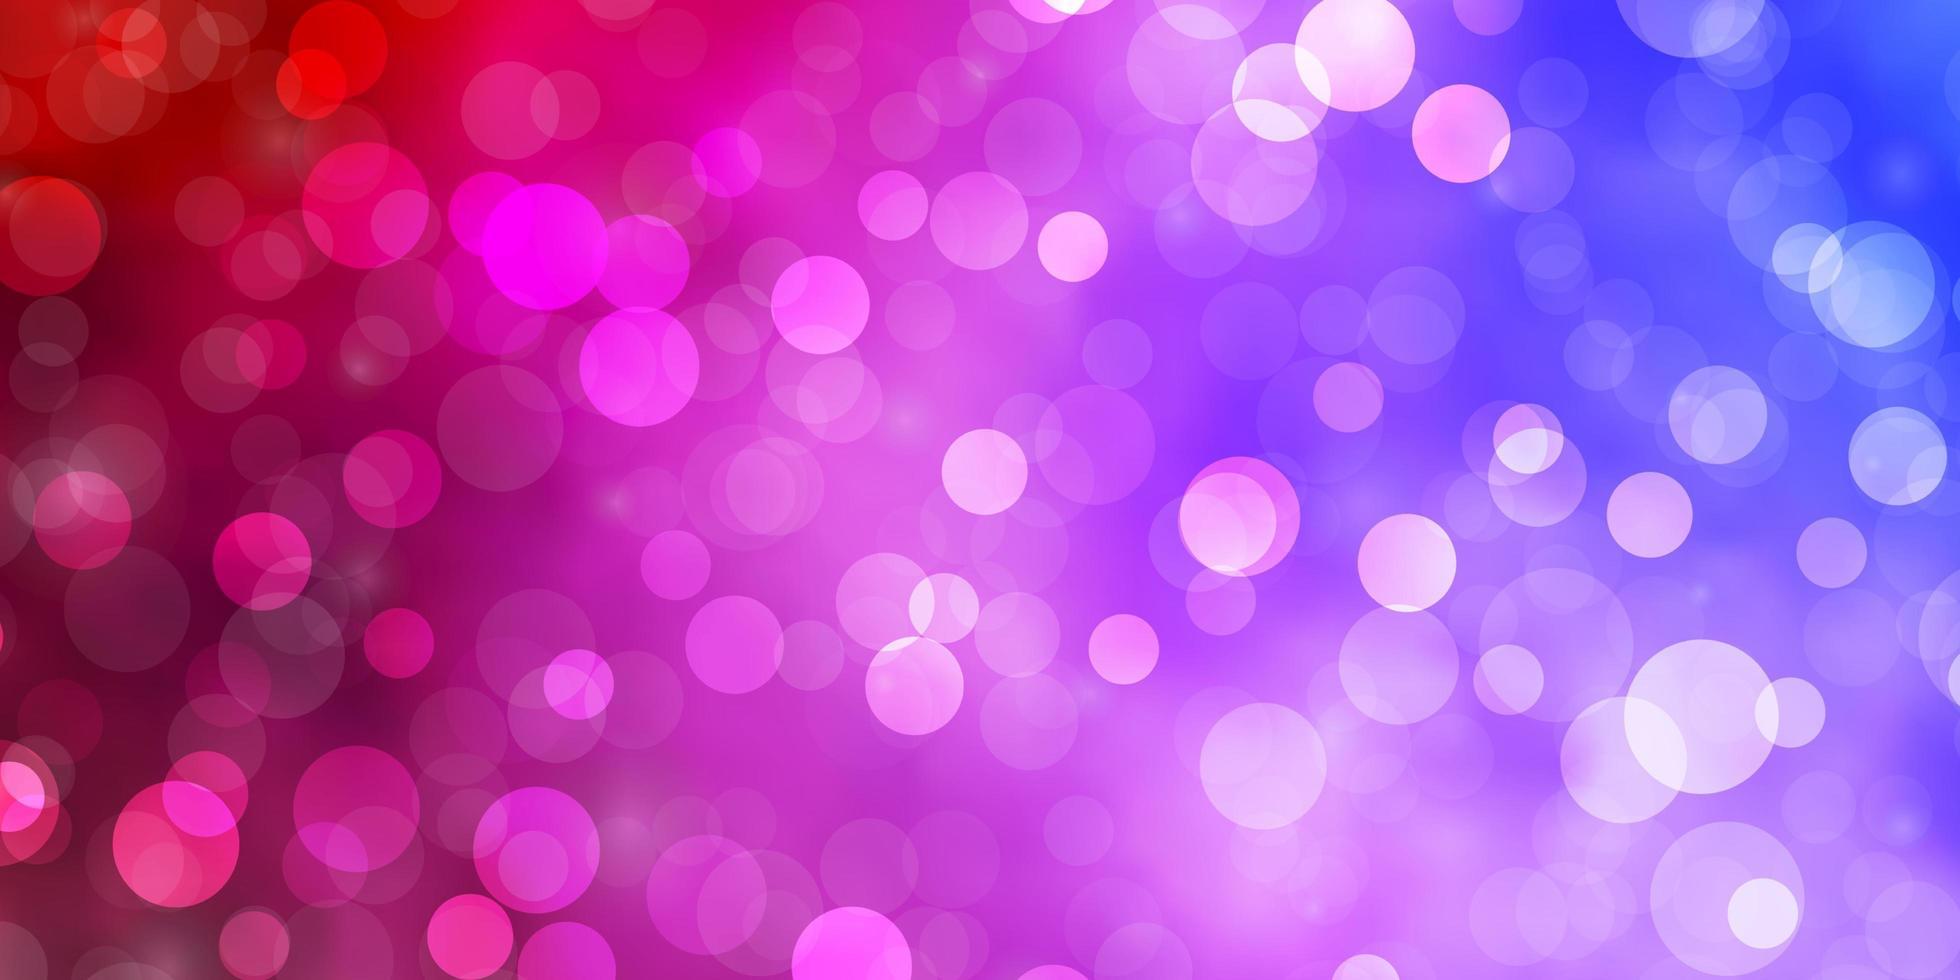 textura azul clara, rosa com círculos. vetor